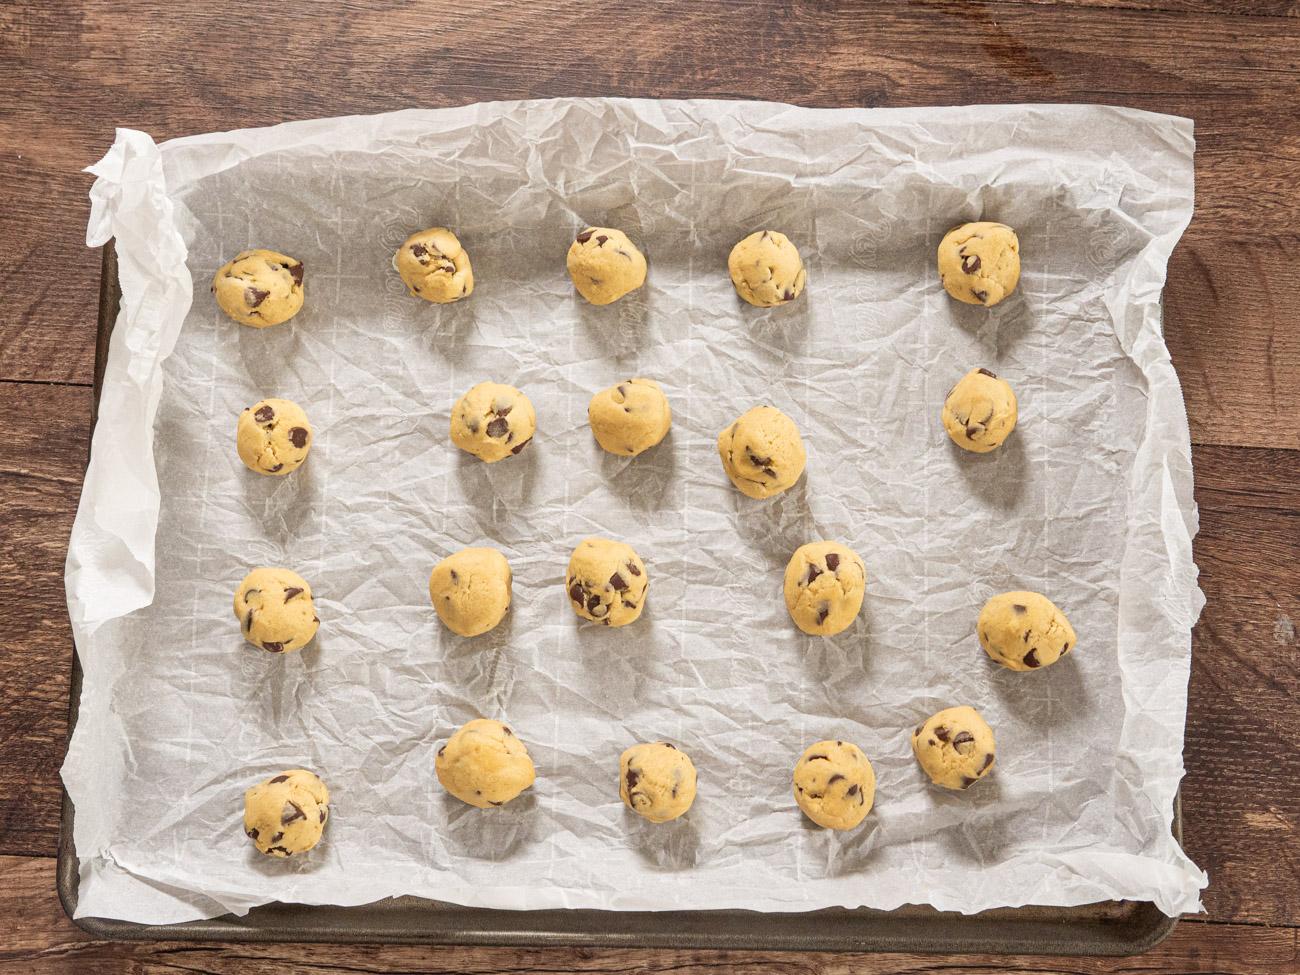 making Cookie Dough Stuffed Chocolate Chip Cookies